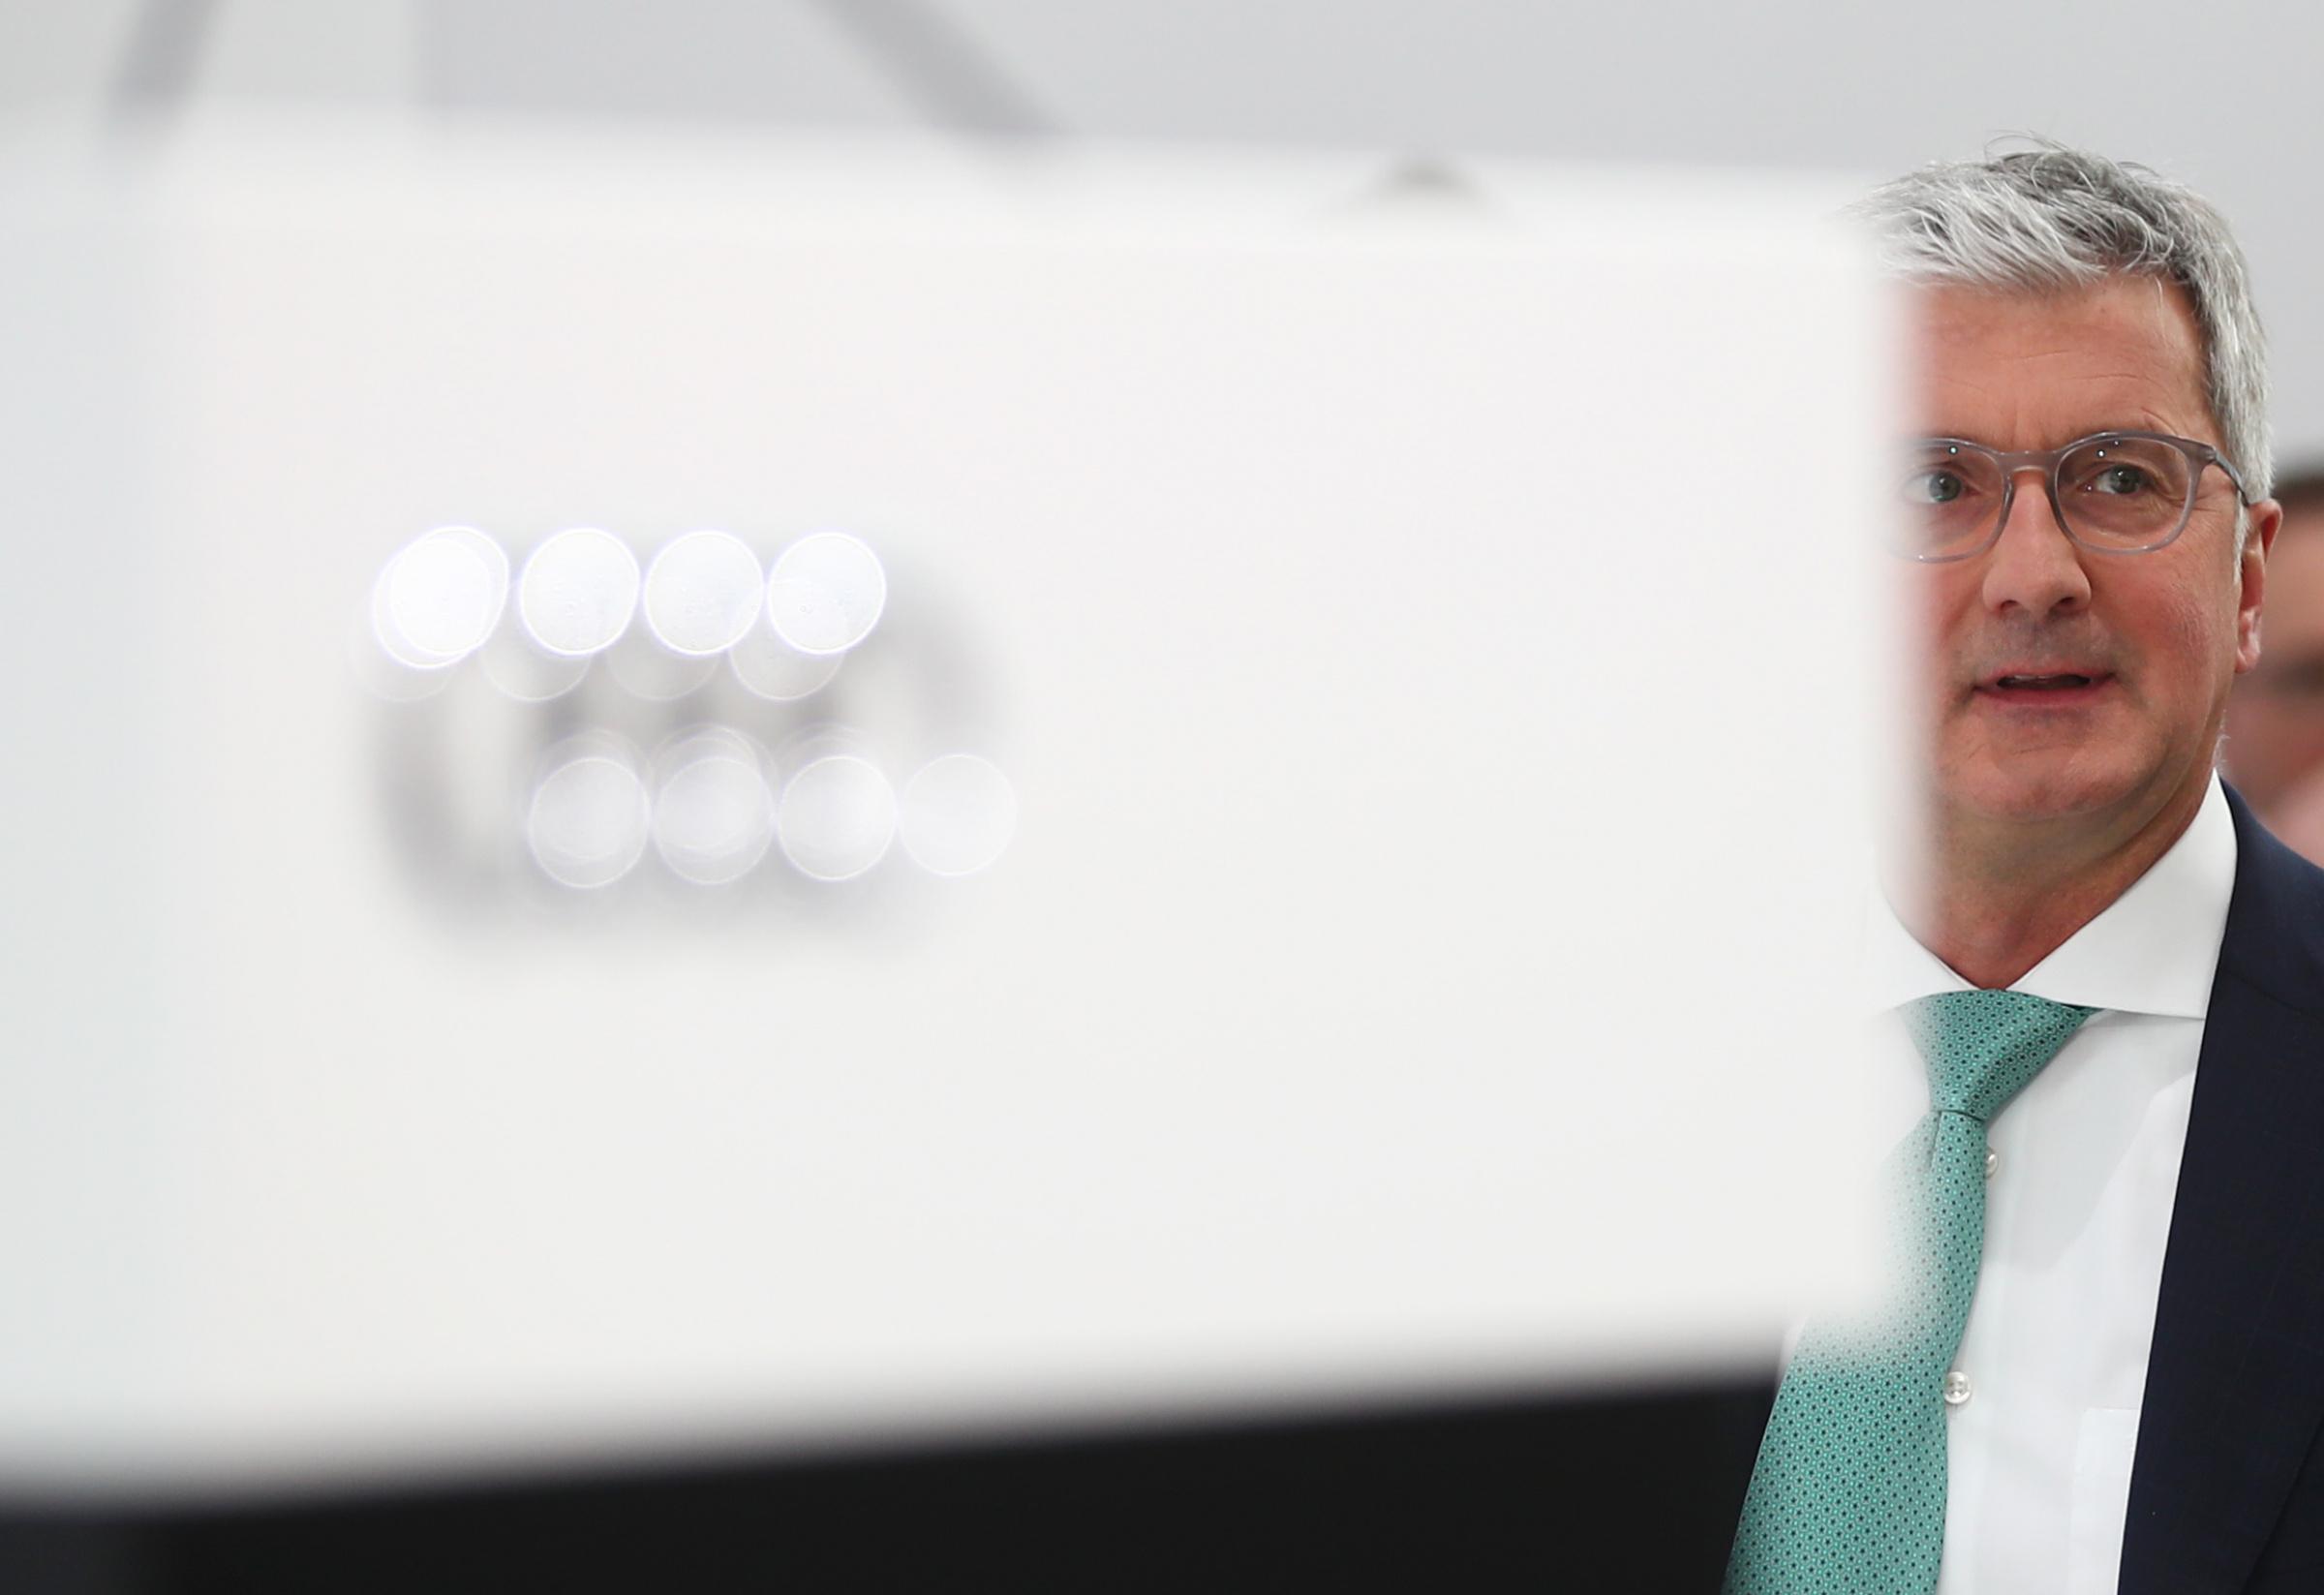 Audi tegevjuht Rupert Stadler. Foto: REUTERS/Michael Dalder